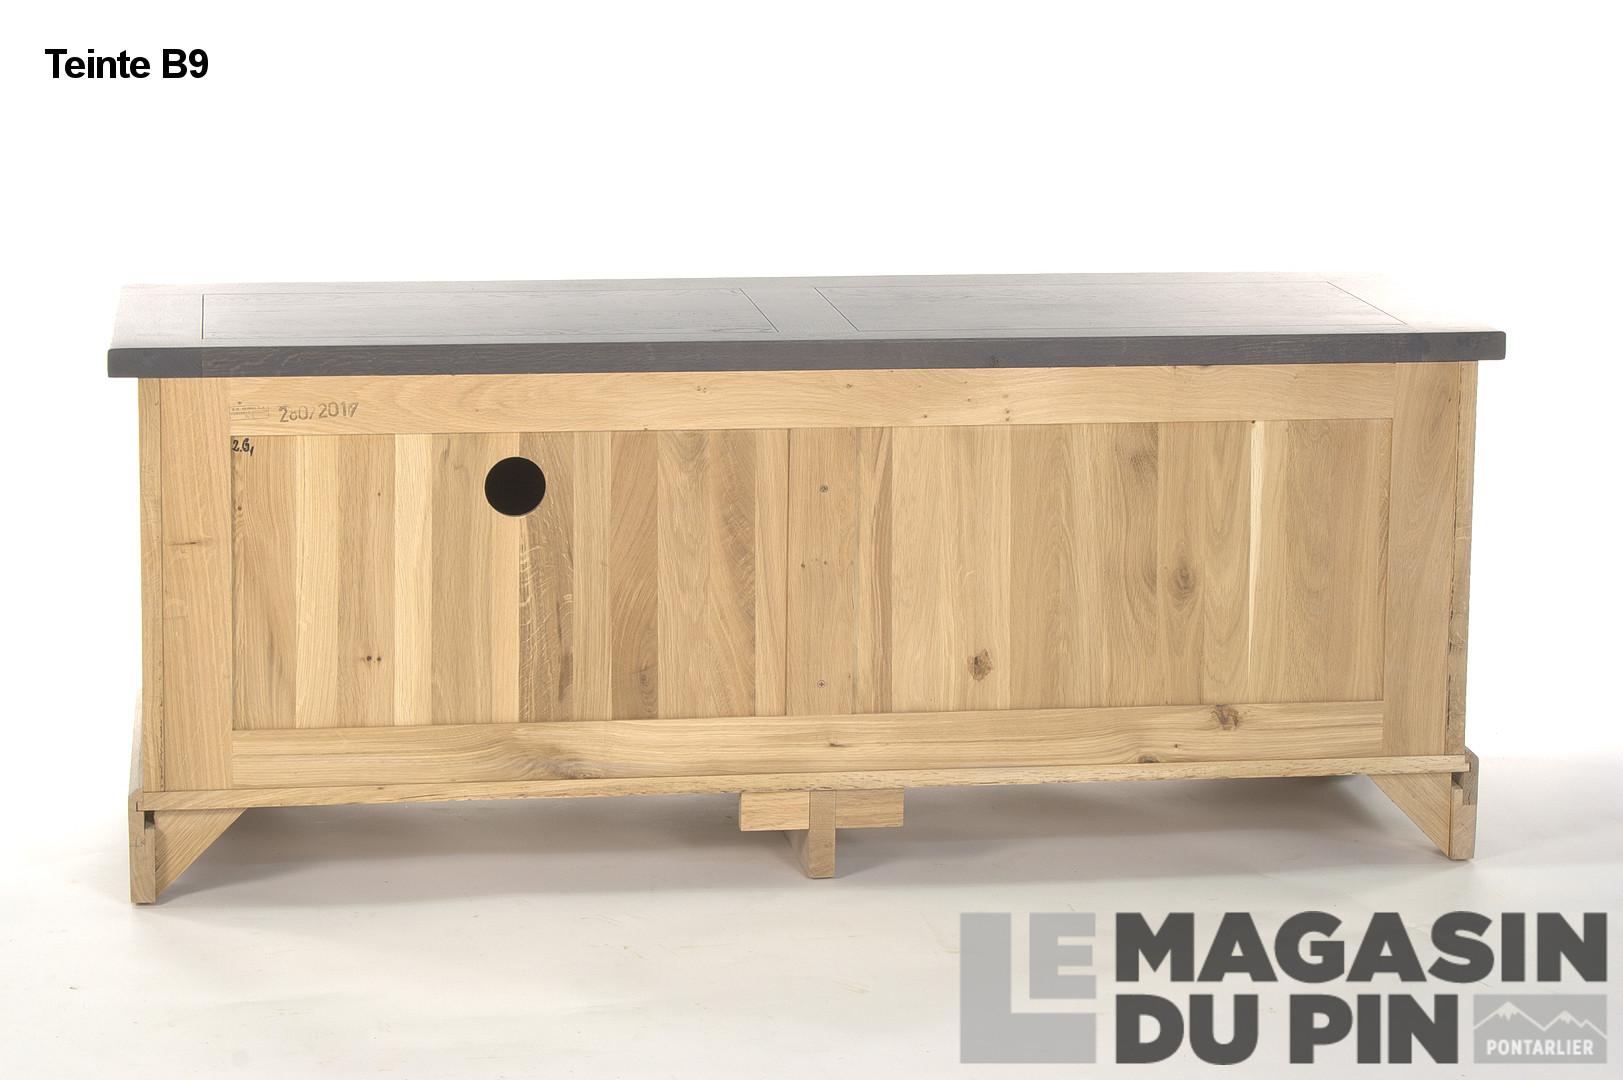 Meuble Tv Porquerolles Ch Ne Massif Le Magasin Du Pin # Meuble Tv En Chene Massif Clair